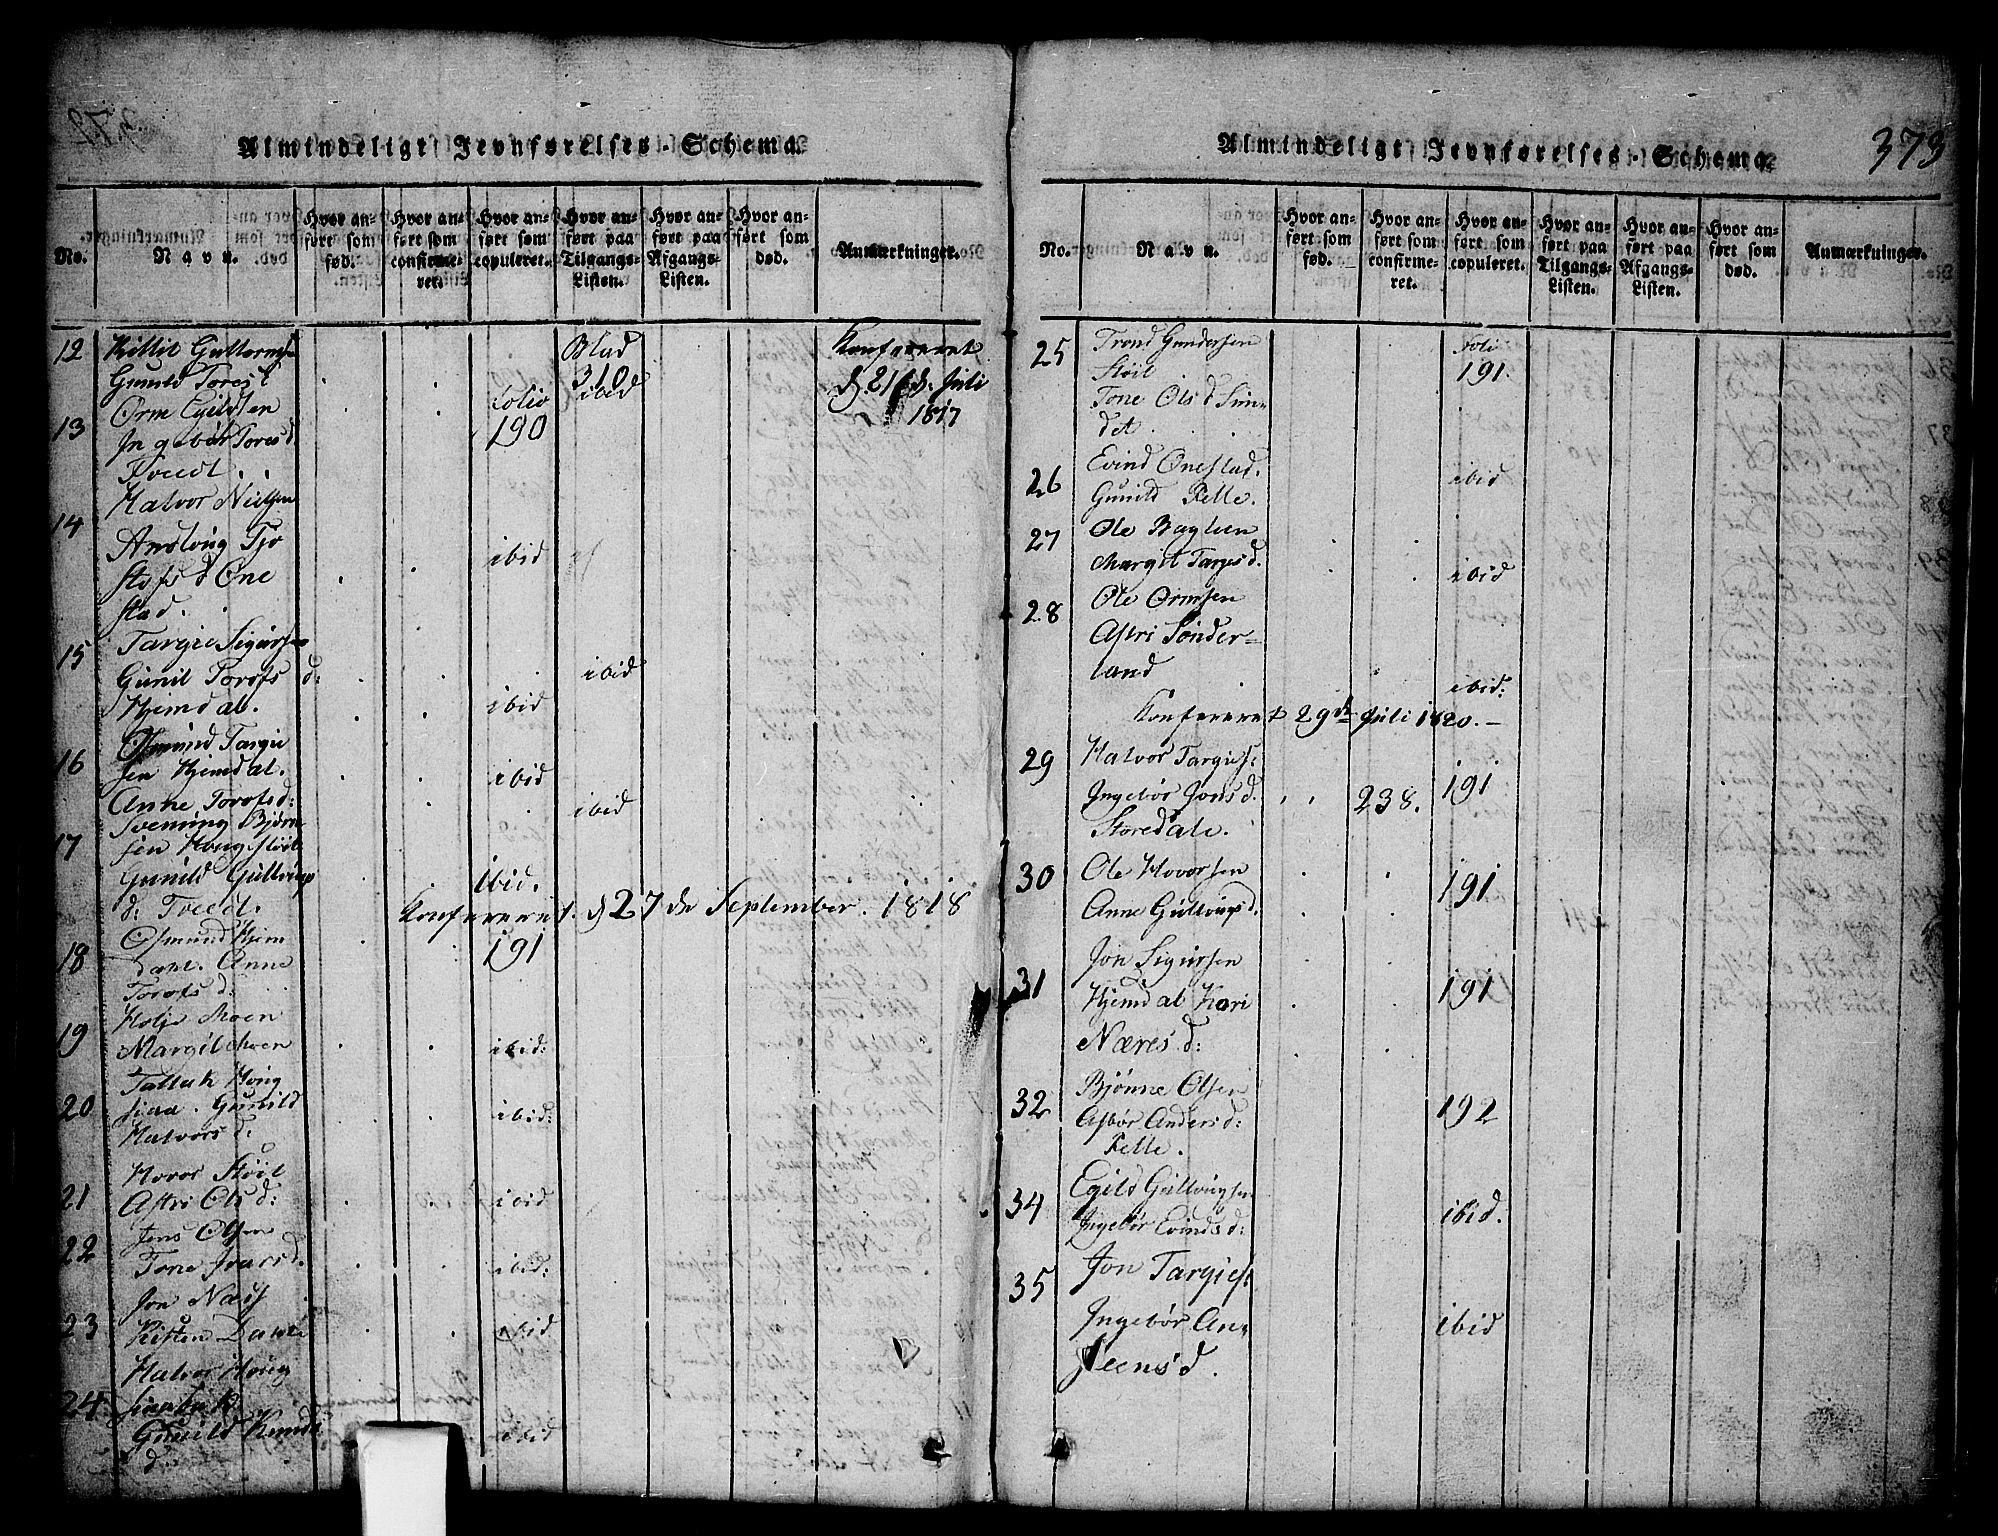 SAKO, Nissedal kirkebøker, G/Gb/L0001: Klokkerbok nr. II 1, 1814-1862, s. 373